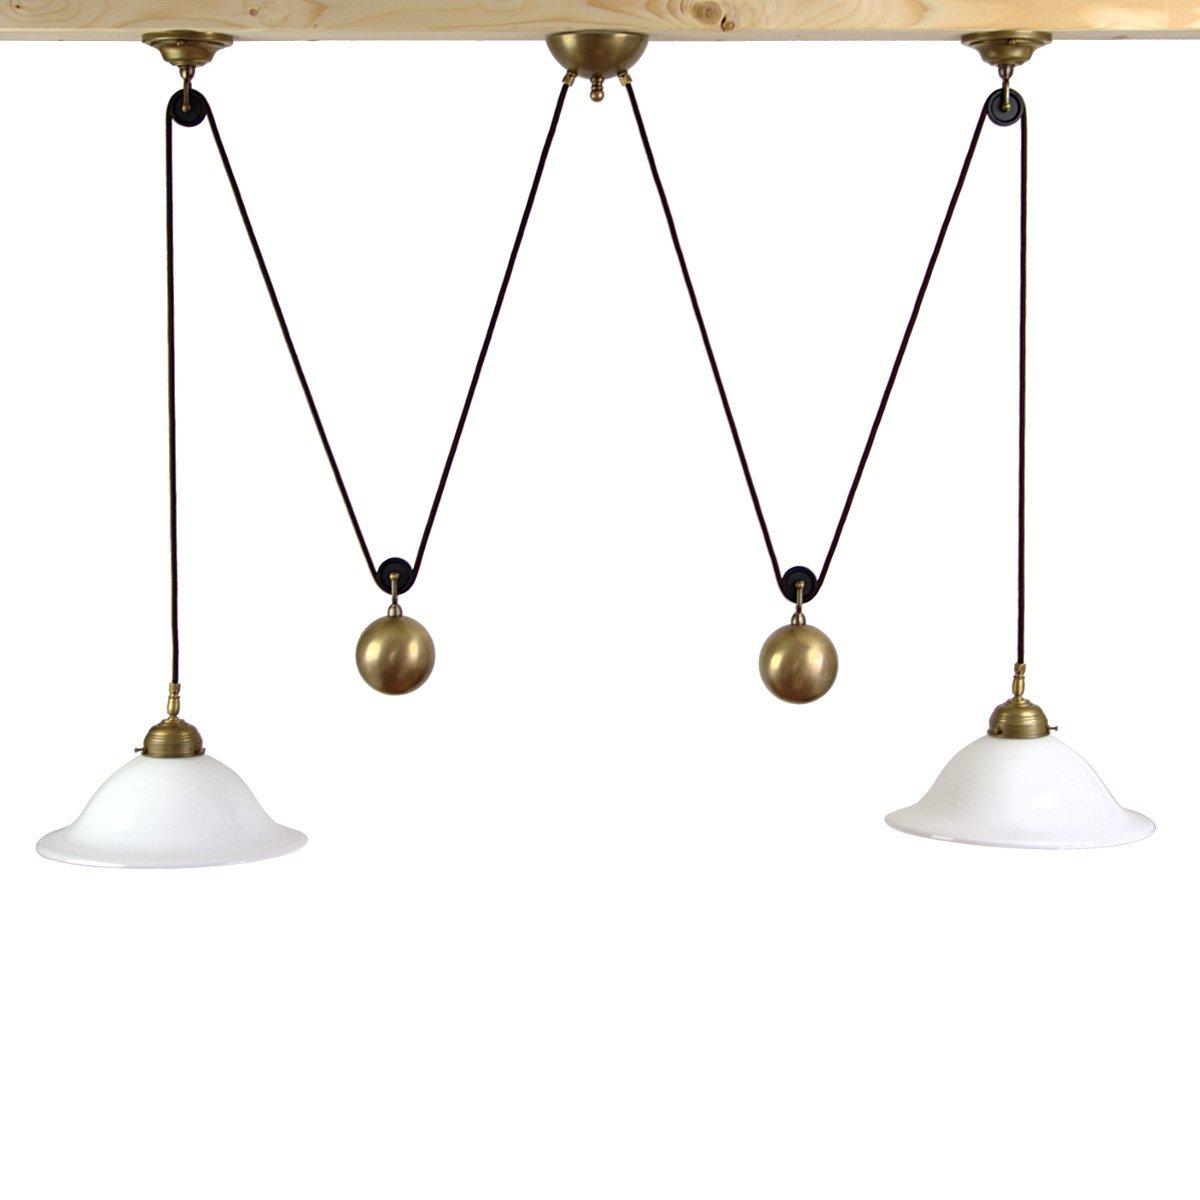 doppelte h ngelampe und zuglampe frieda zur beleuchtung. Black Bedroom Furniture Sets. Home Design Ideas